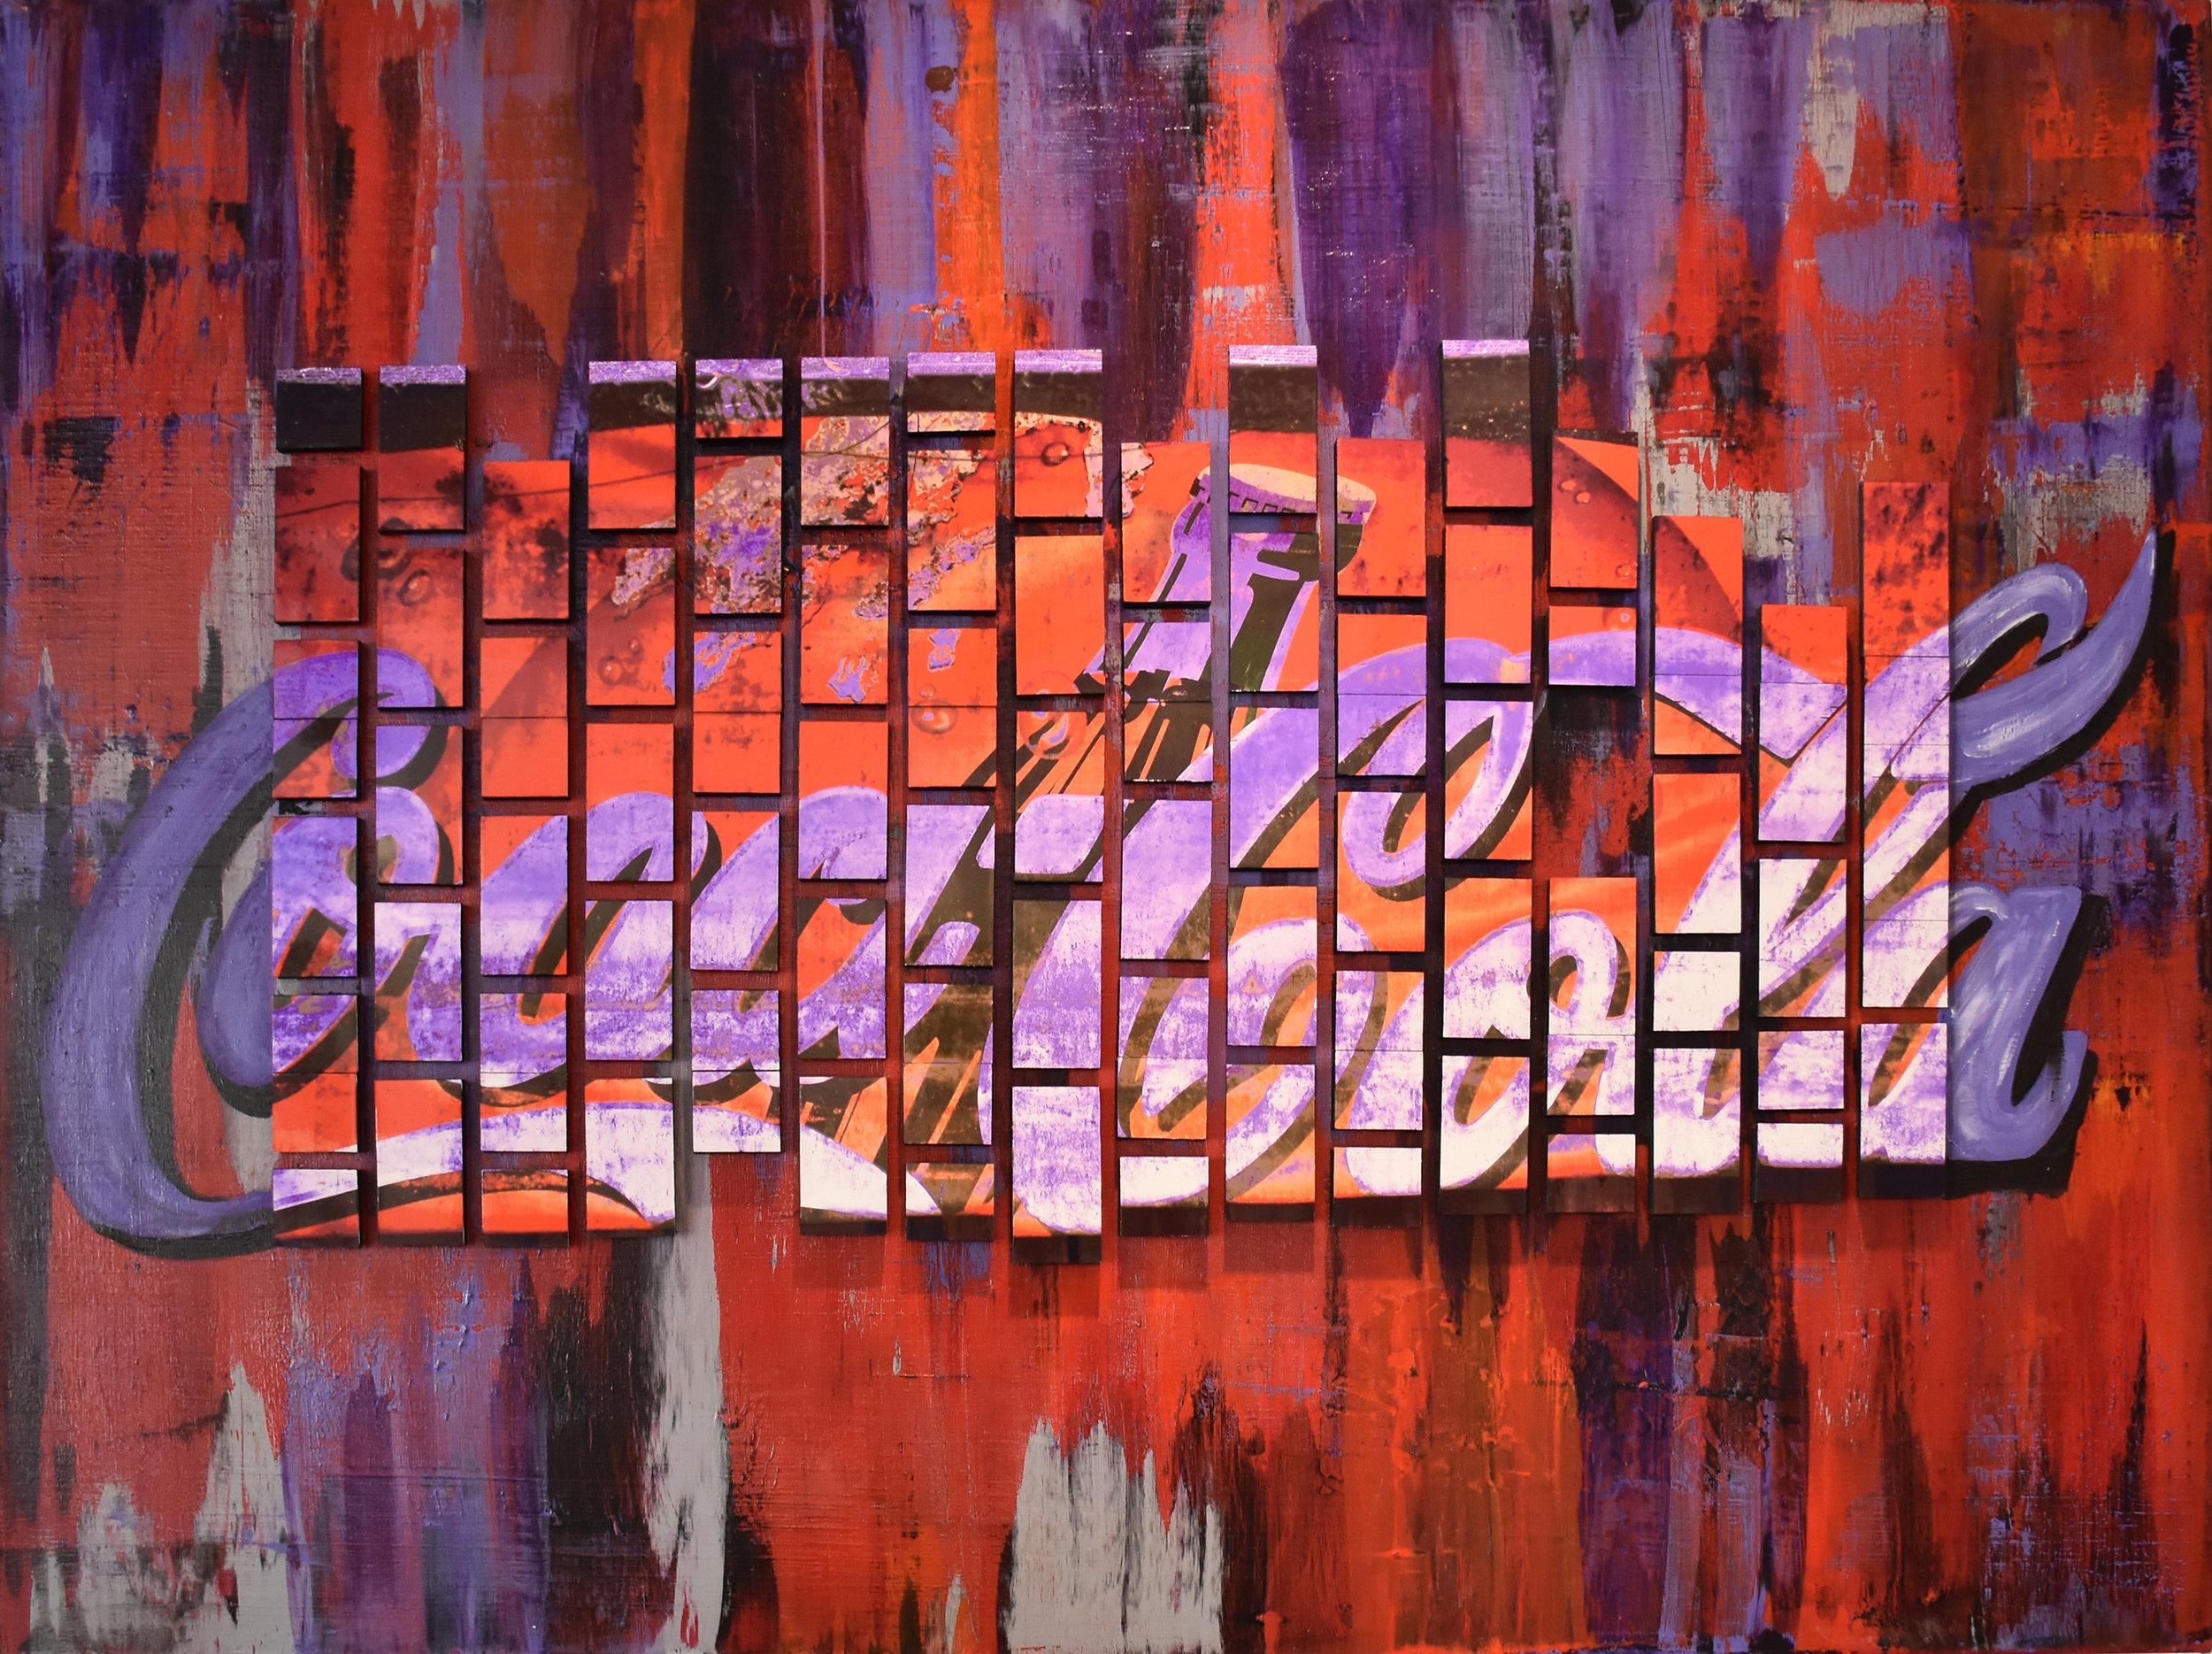 Coca-Cola - Mixed media on canvas130 x 100 cm